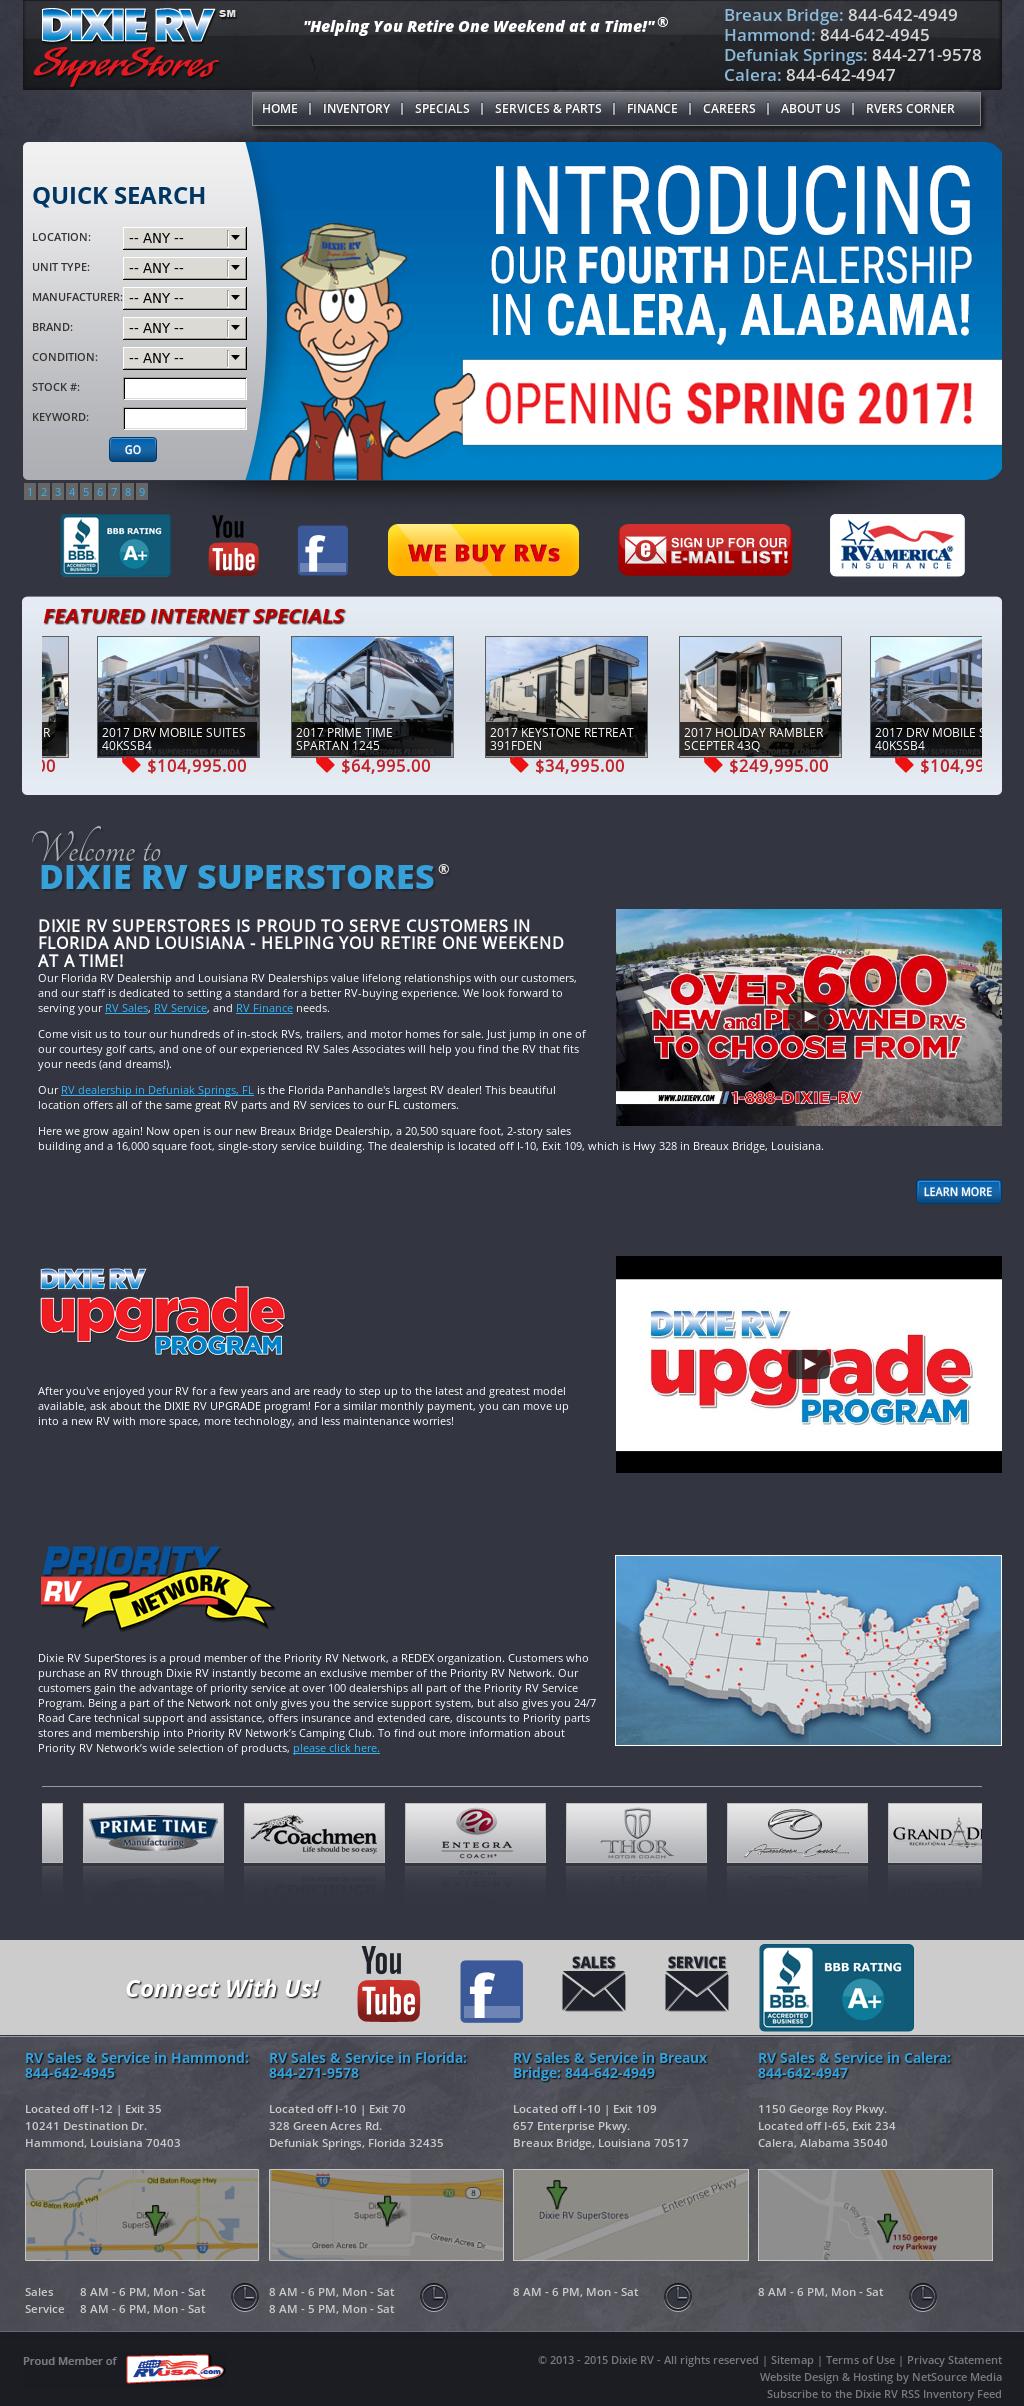 Dixie RV Competitors, Revenue and Employees - Owler Company Profile